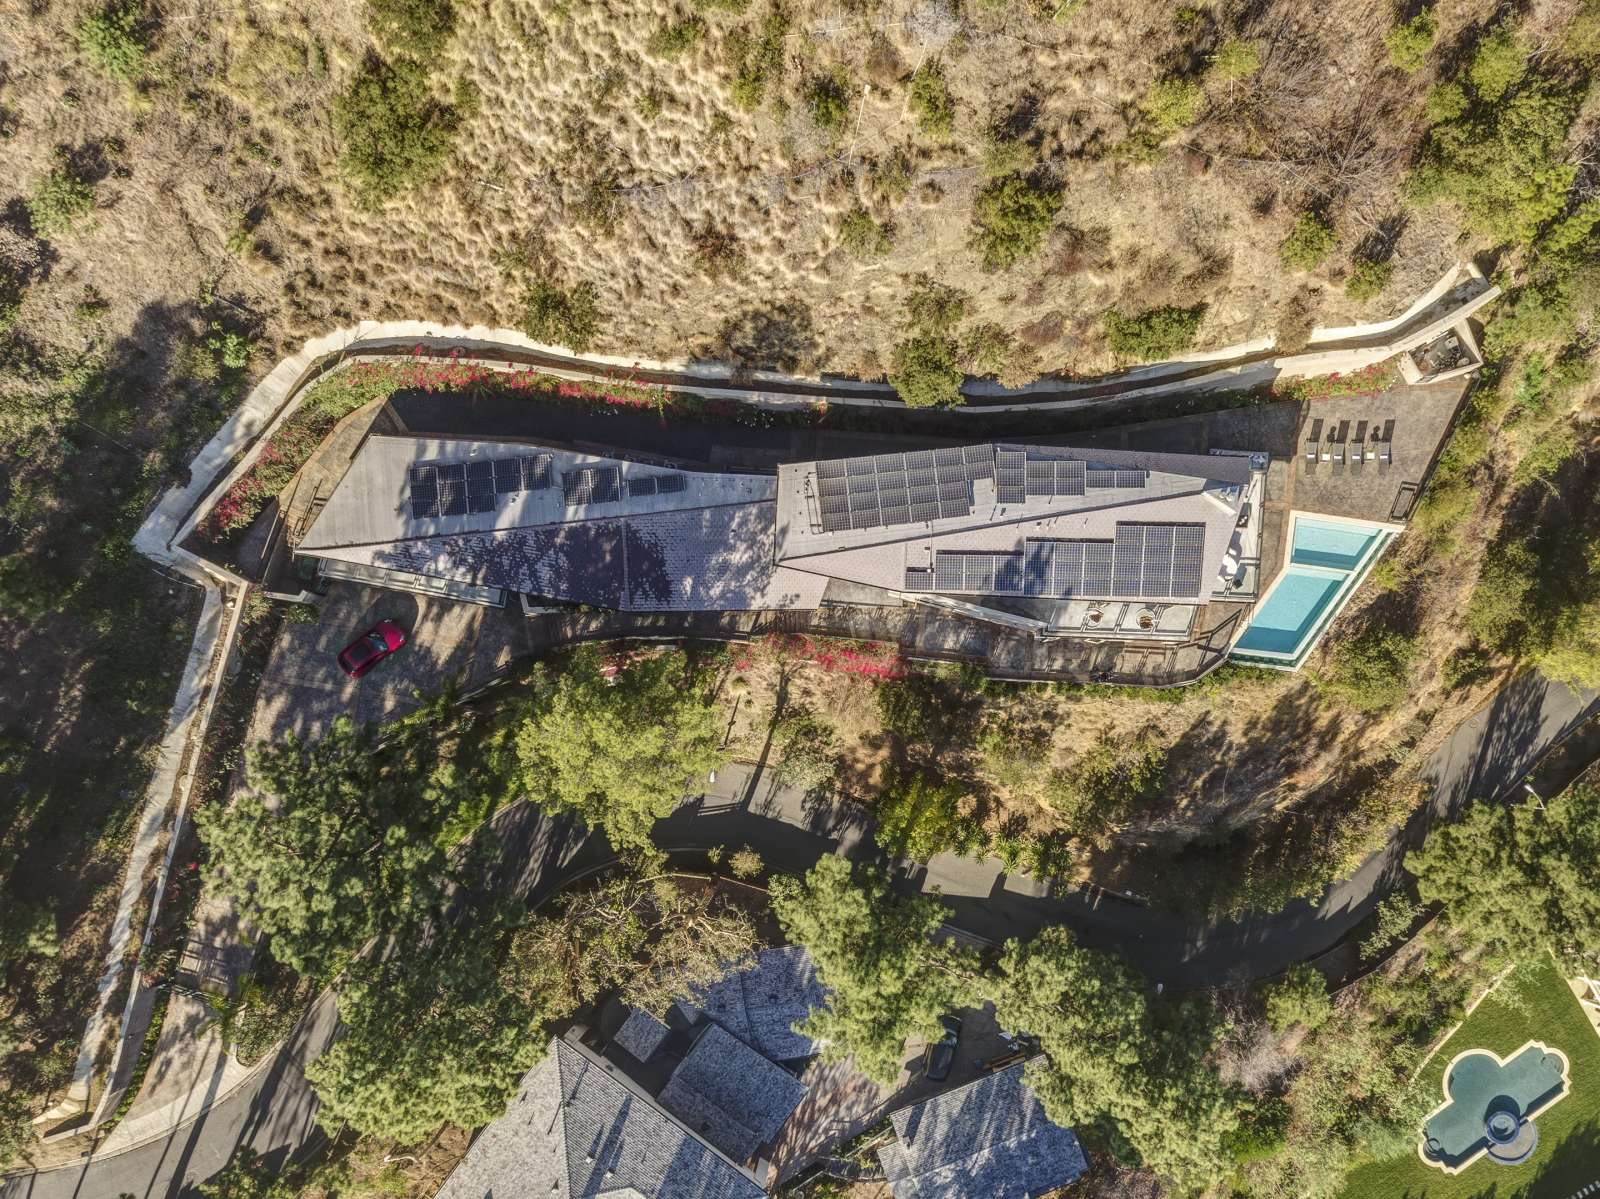 monte-cielo-house-archillusion-desgin-19.jpg